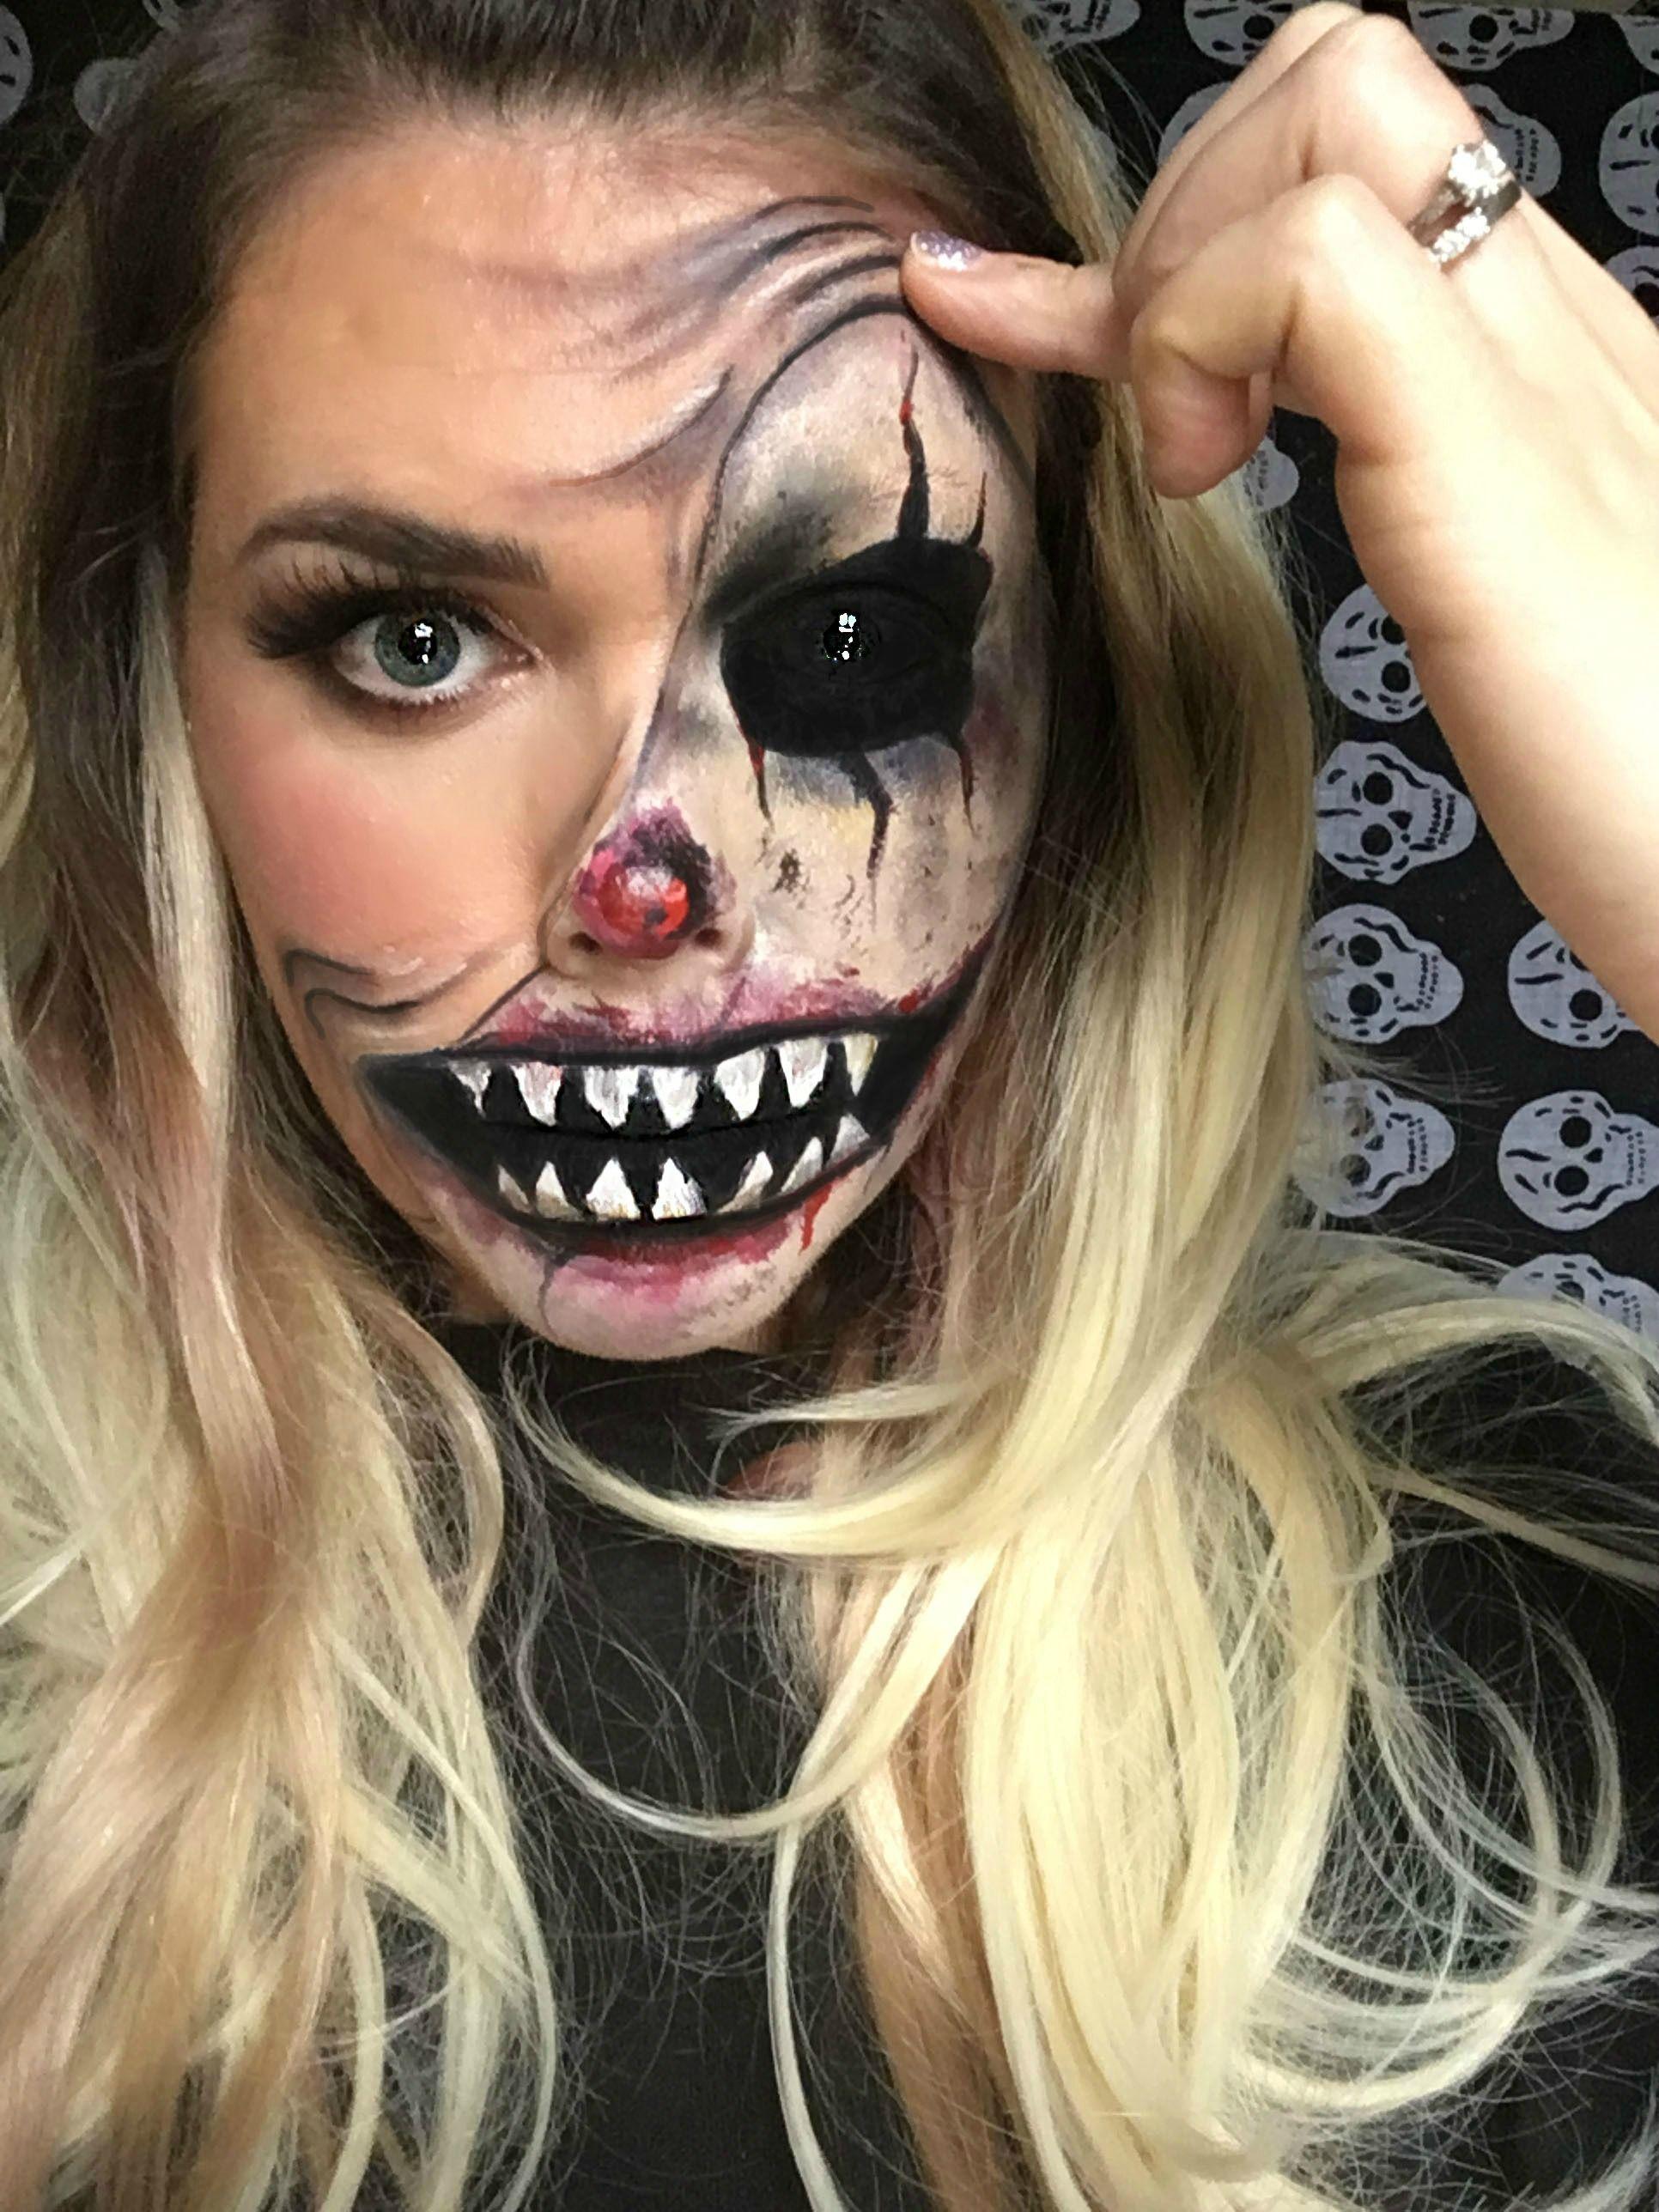 Halloween Makeup Ideas 2019 Scary.Scary Half Clown Makeup Facepaint In 2019 Halloween